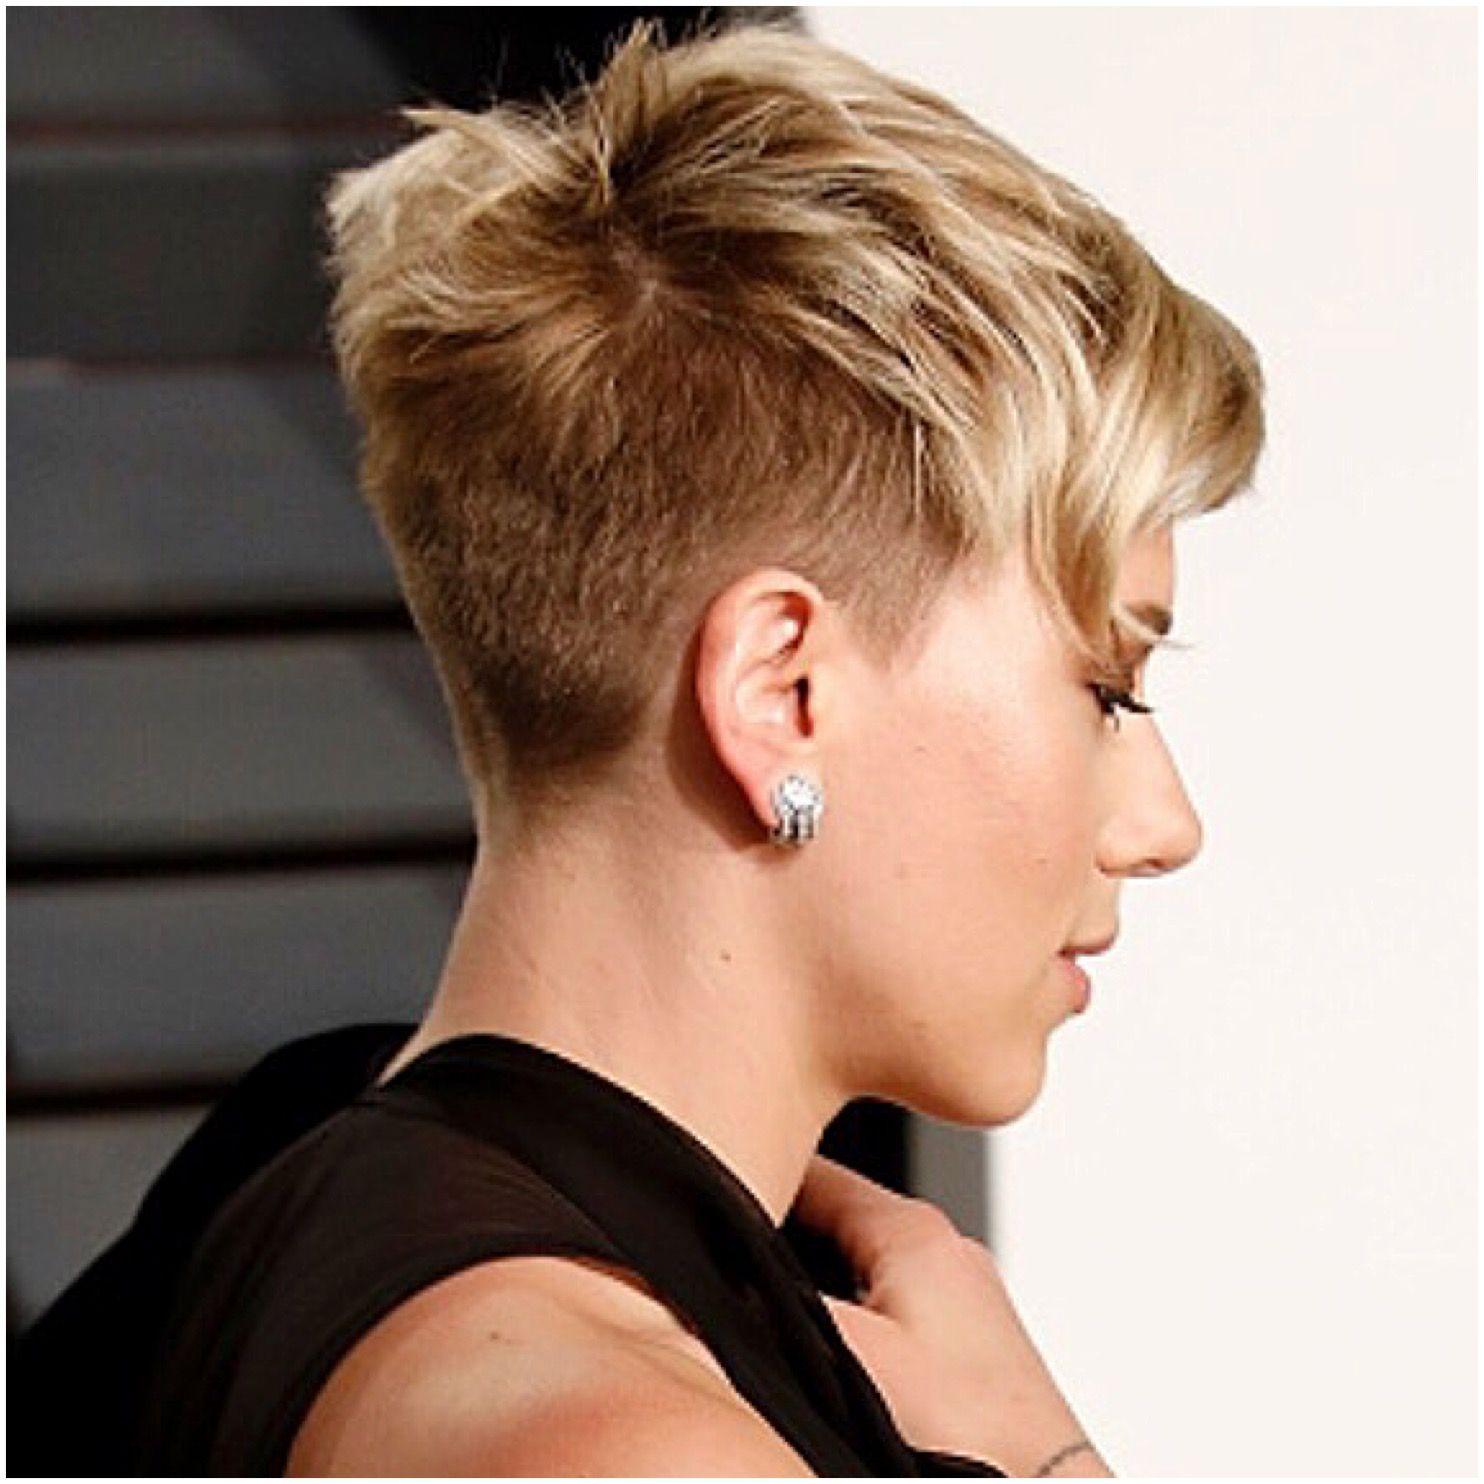 Scarlett Johansson tyimages Short hair Pinterest